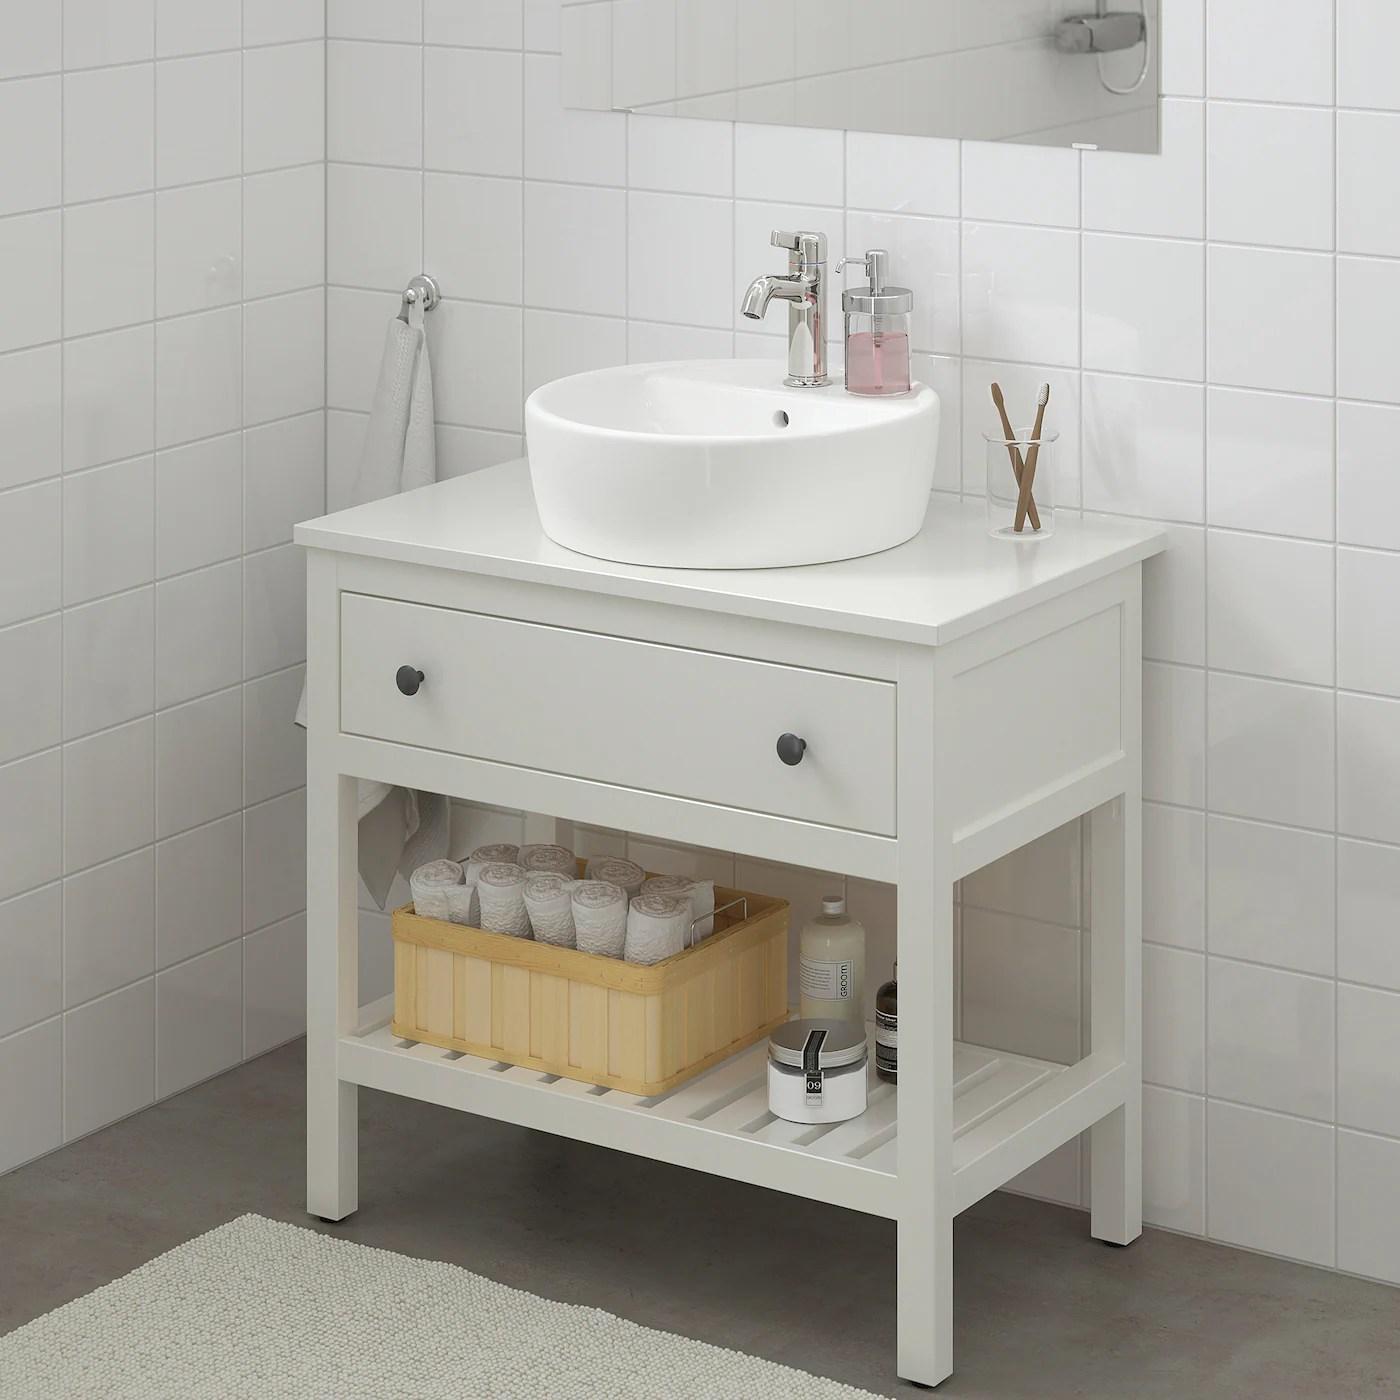 hemnes tornviken open sink cabinet with 17 sink white voxnan faucet 32 1 4x18 7 8x35 3 8